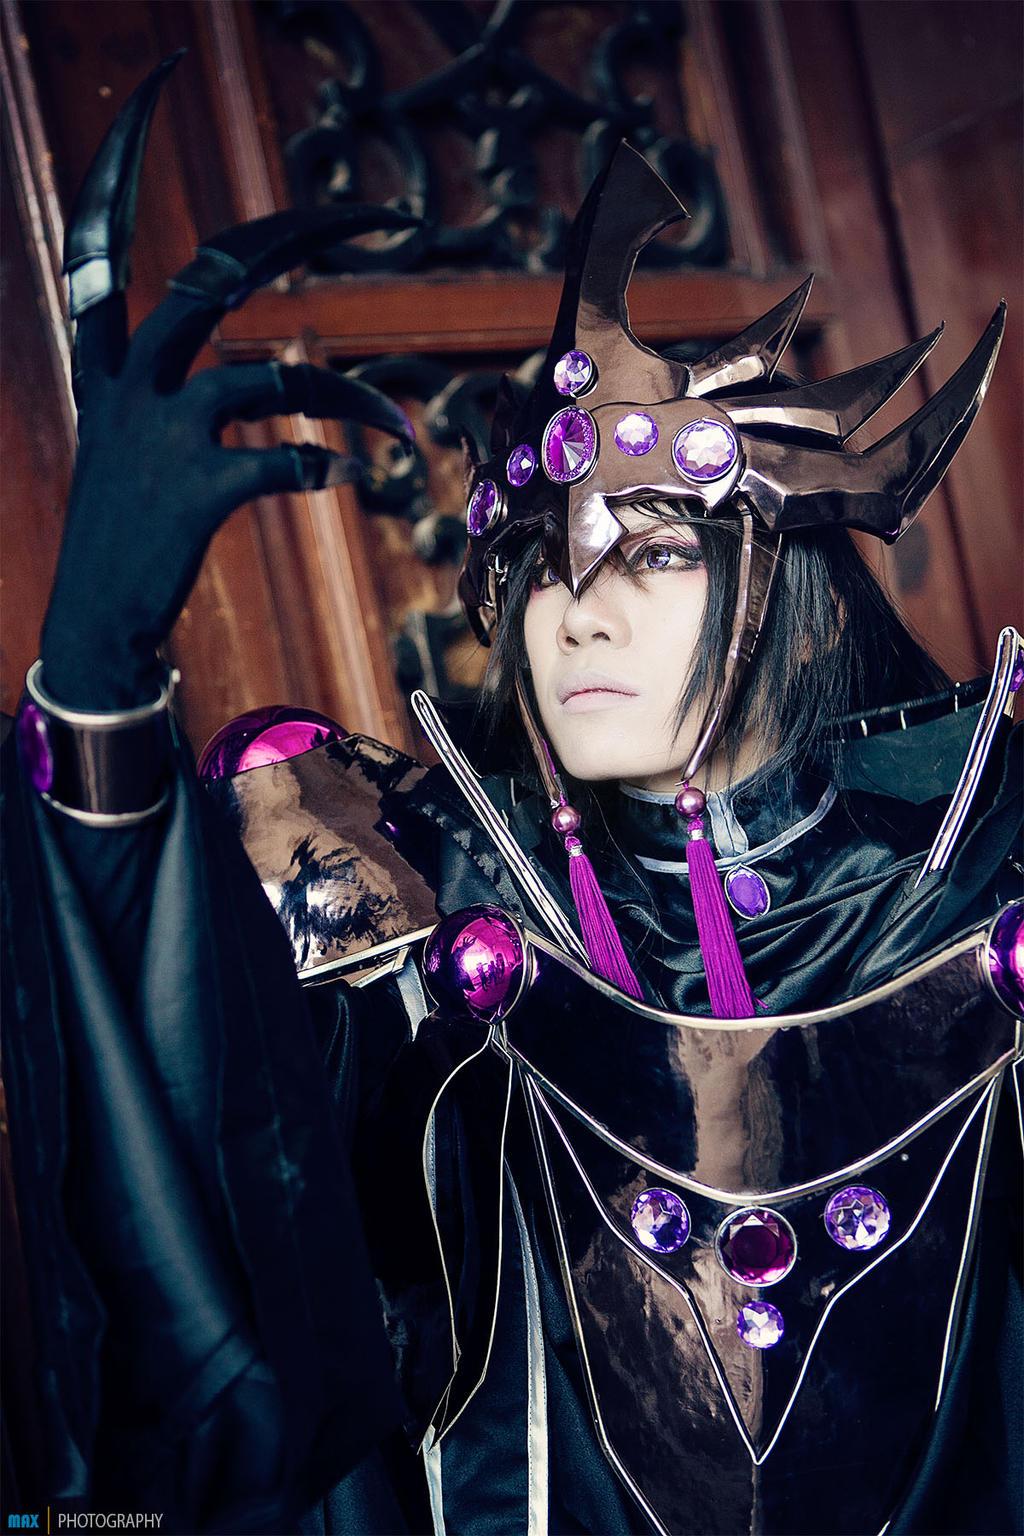 [Resim: cosplay___zagato___magic_knight_rayearth...59edon.jpg]